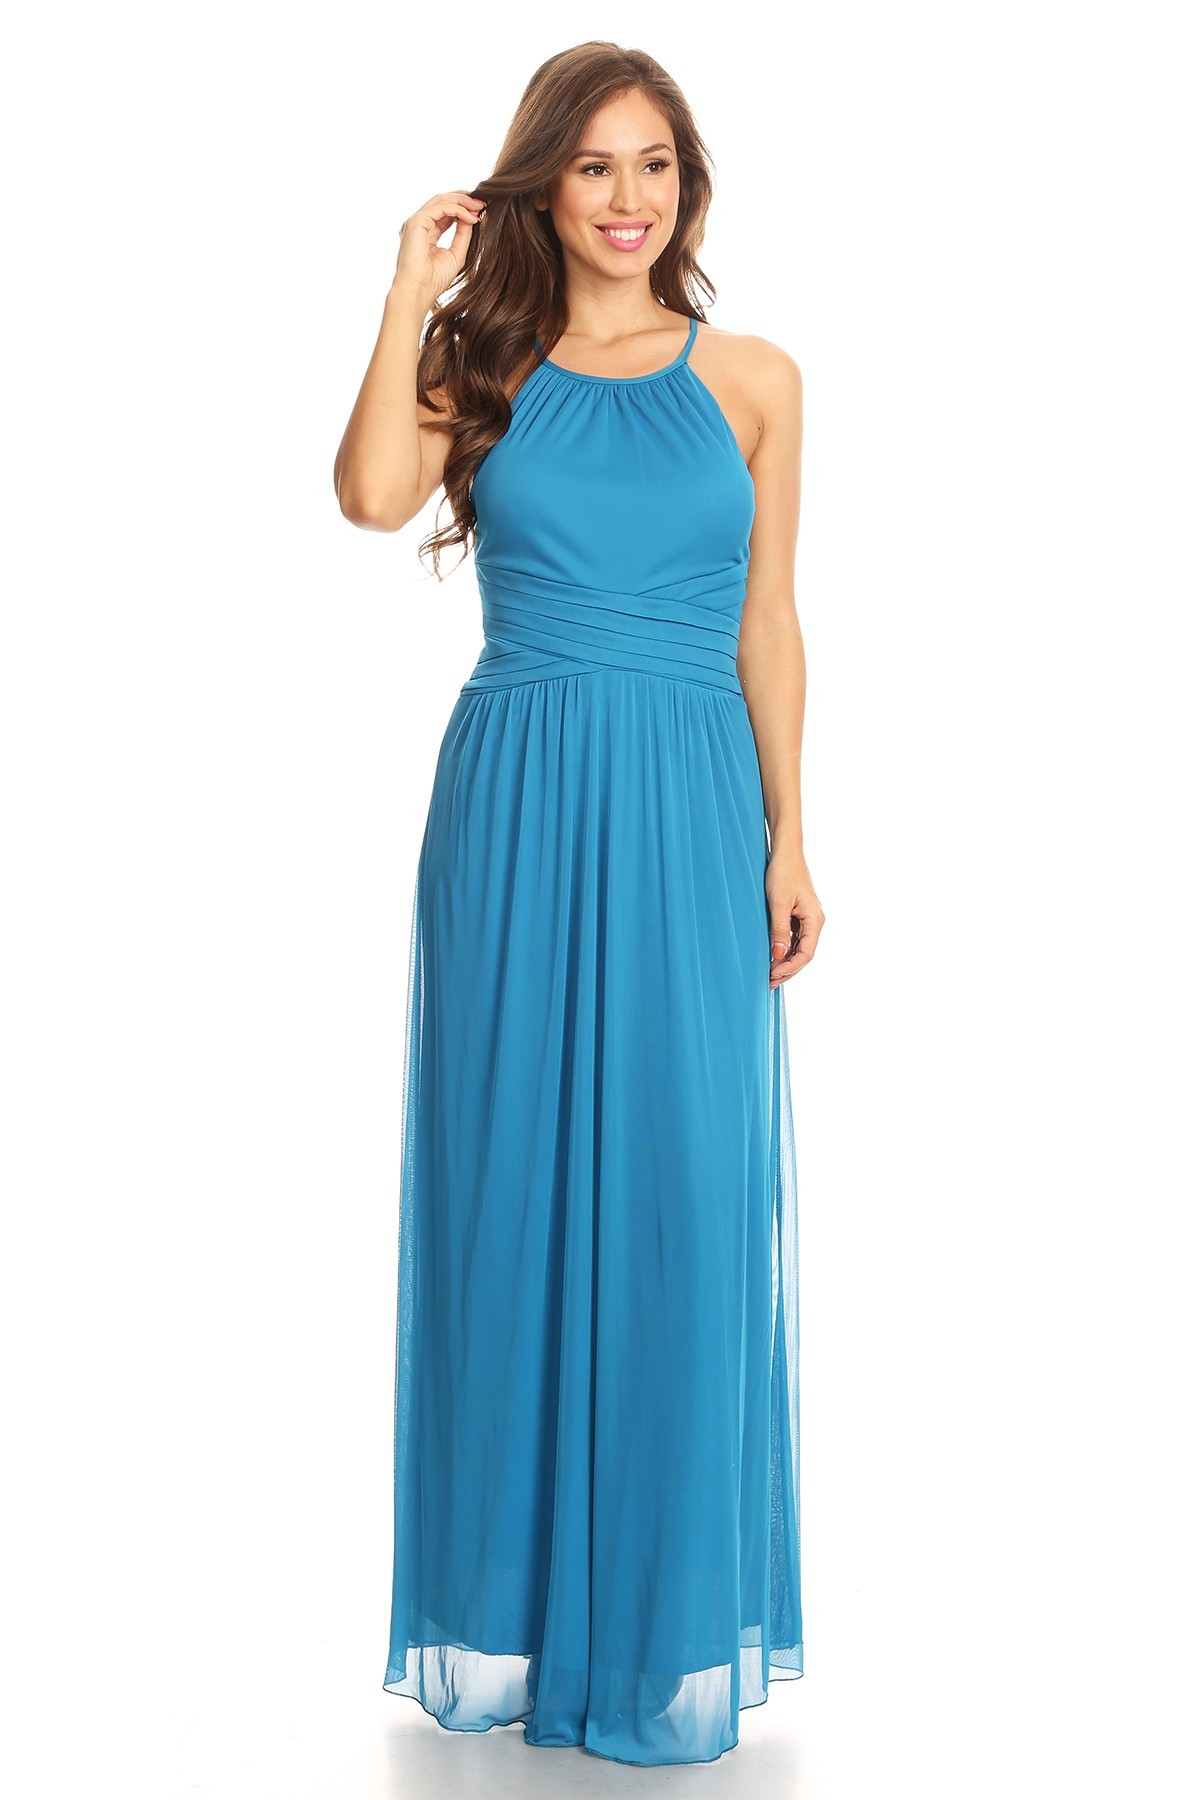 Buy Designer Fuschia Halter Gown For Women Online - Kahini Fashion